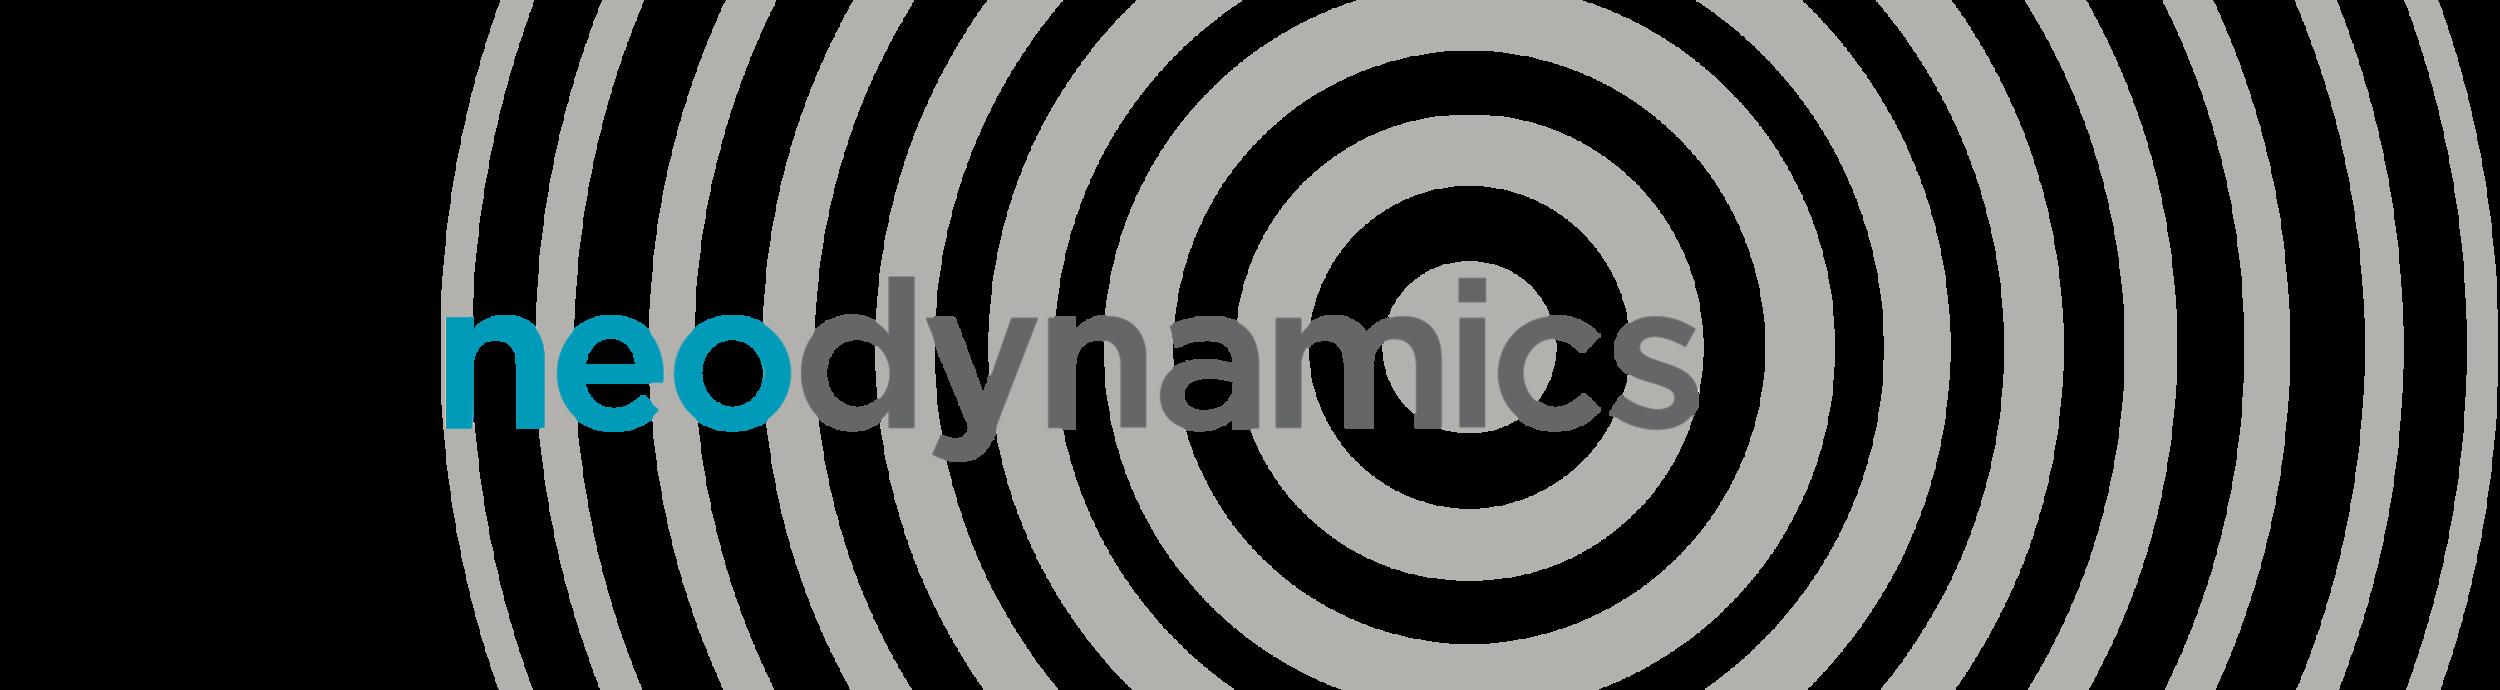 Neodynamics_logo_Circles_2.png